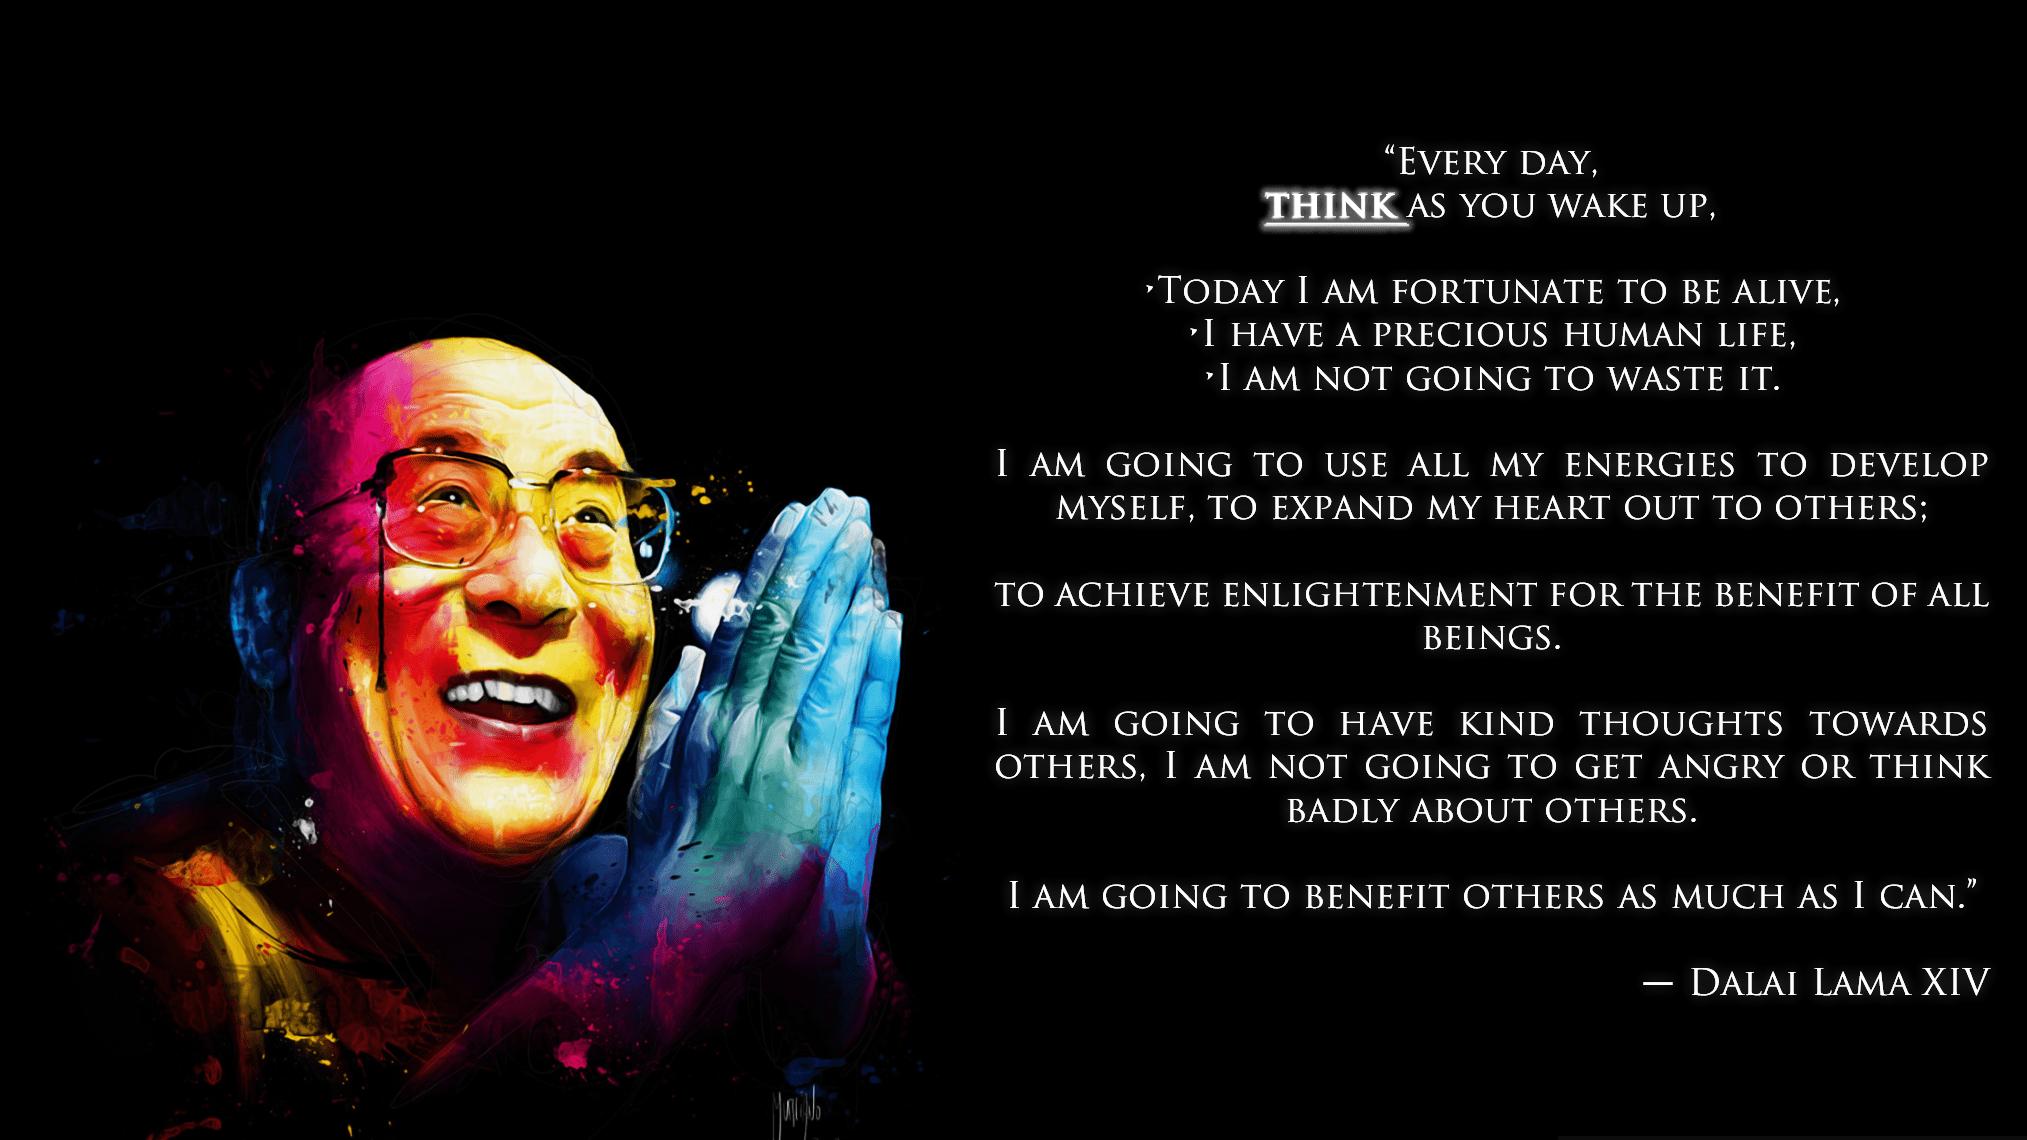 """Every day, Think as you wake up…"" ― Dalai Lama XIV [2027×1140]"